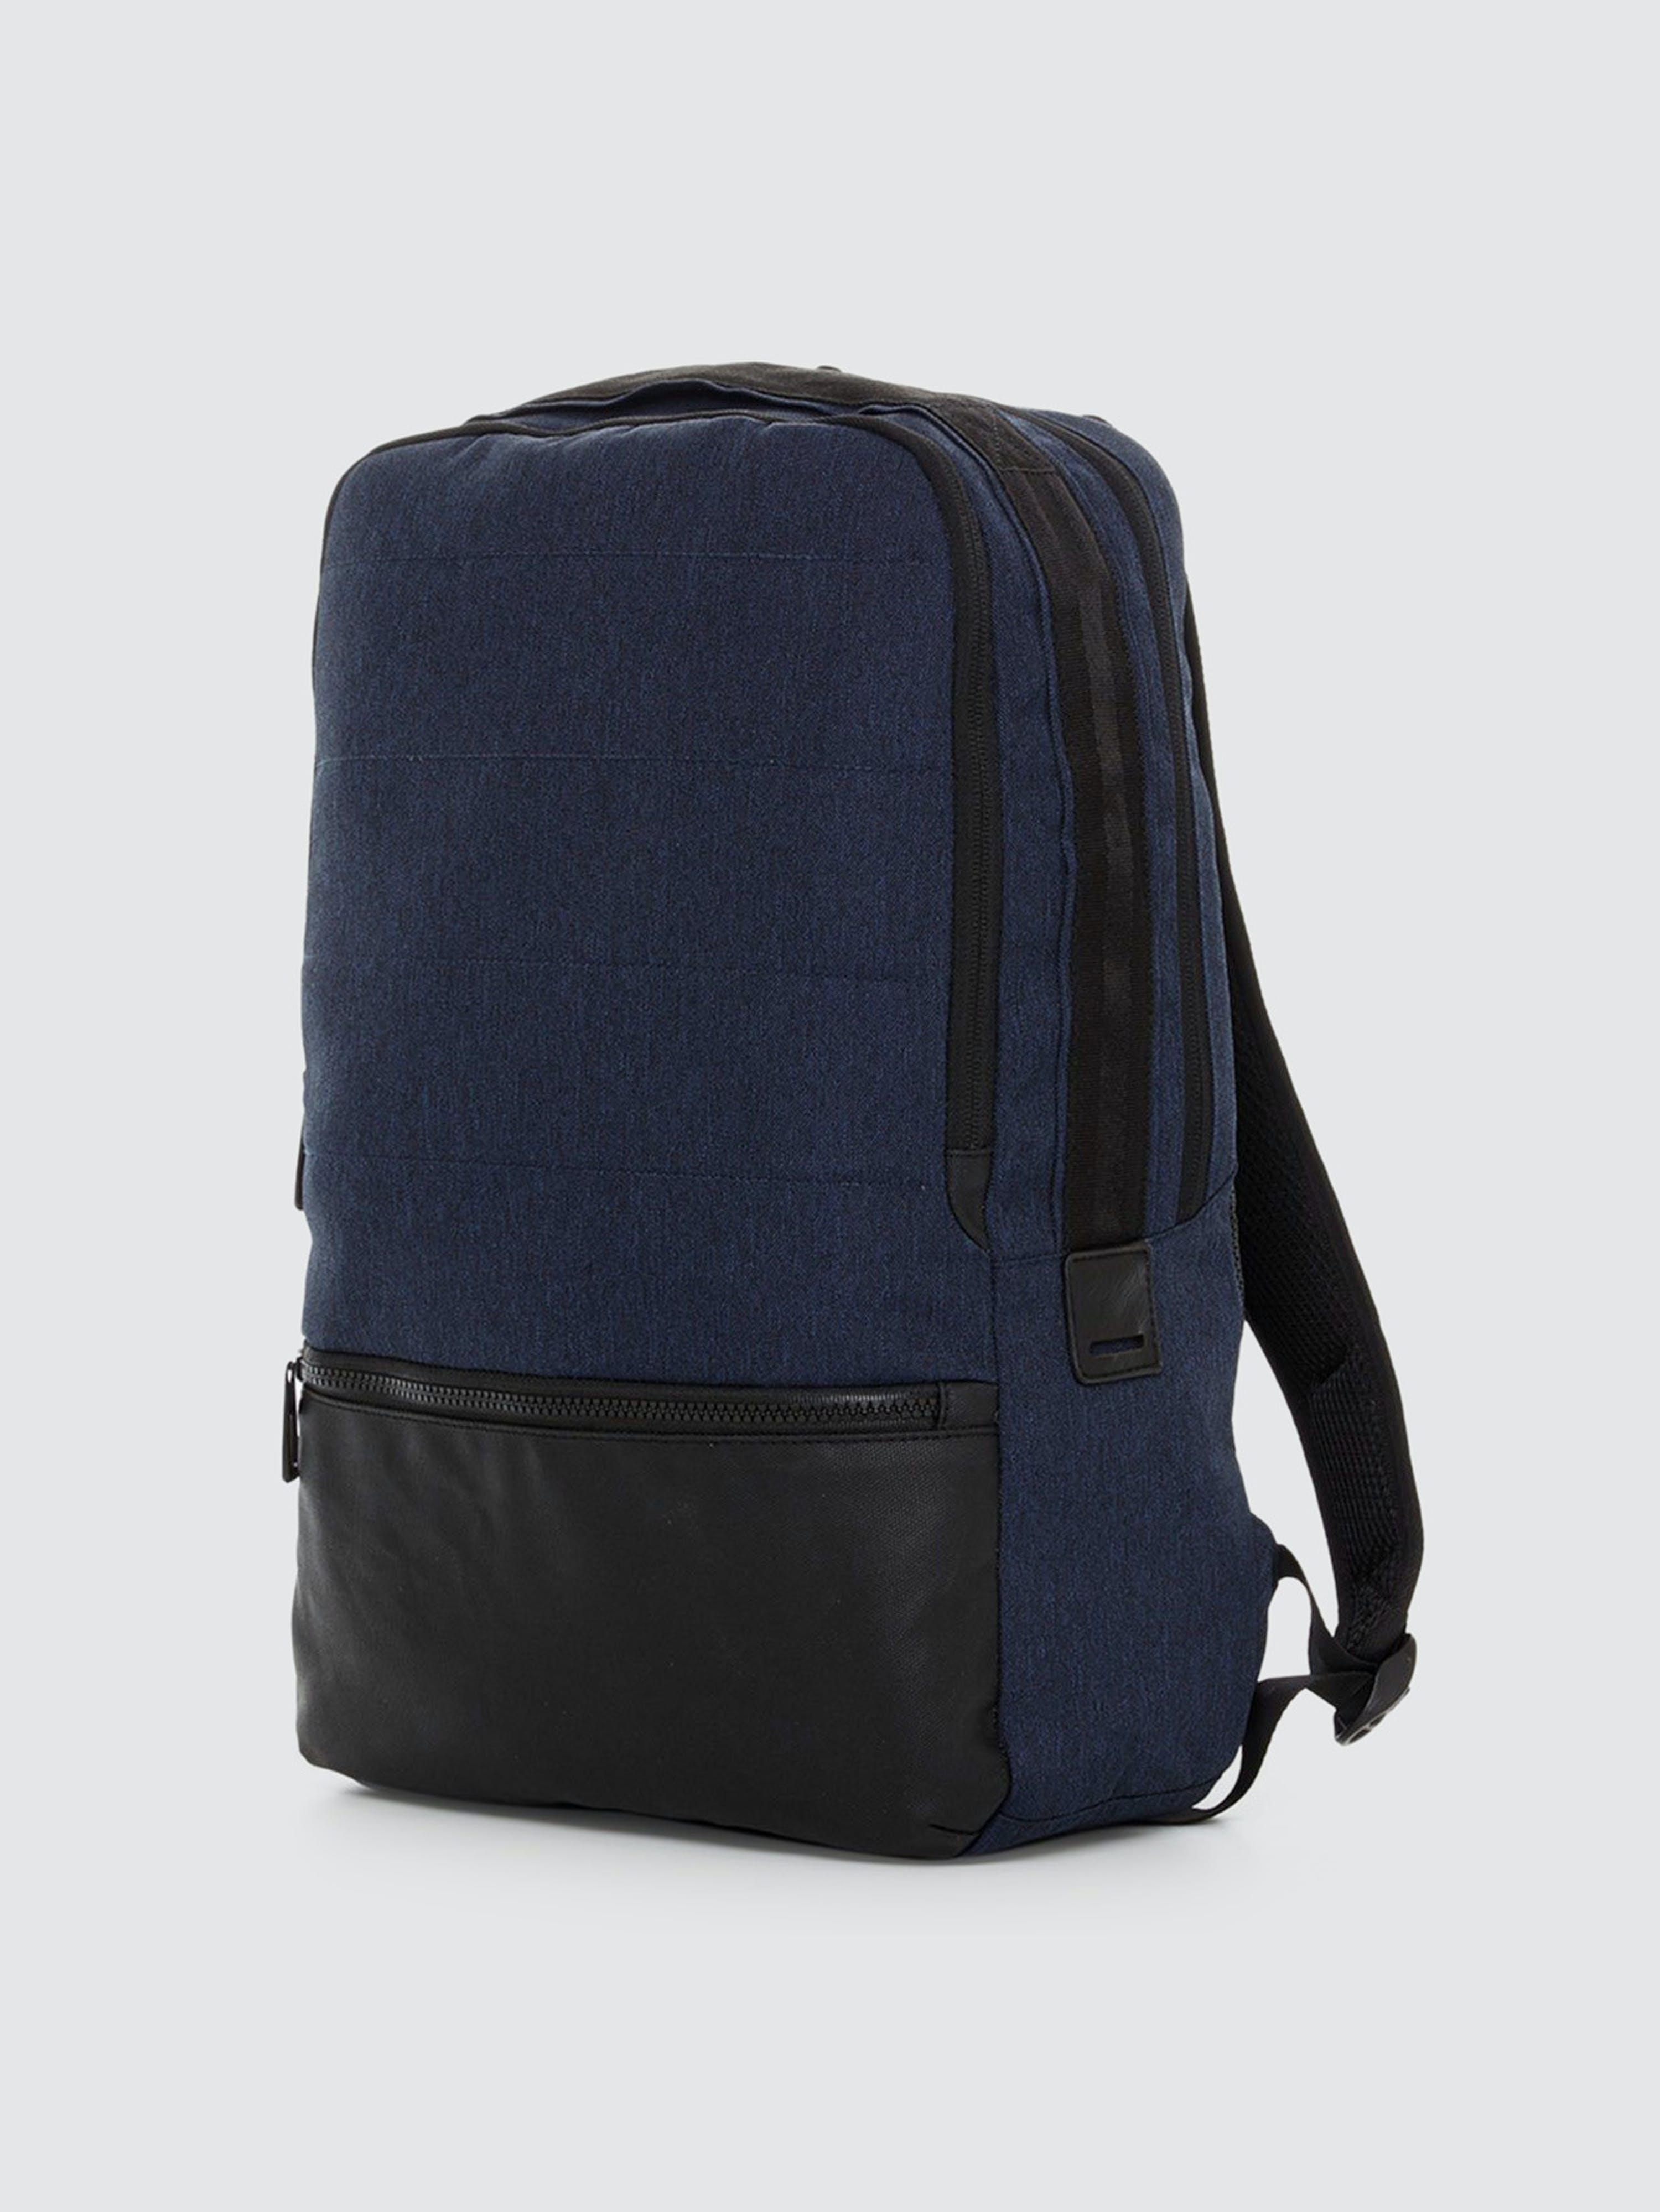 Px Hank Backpack In Blue